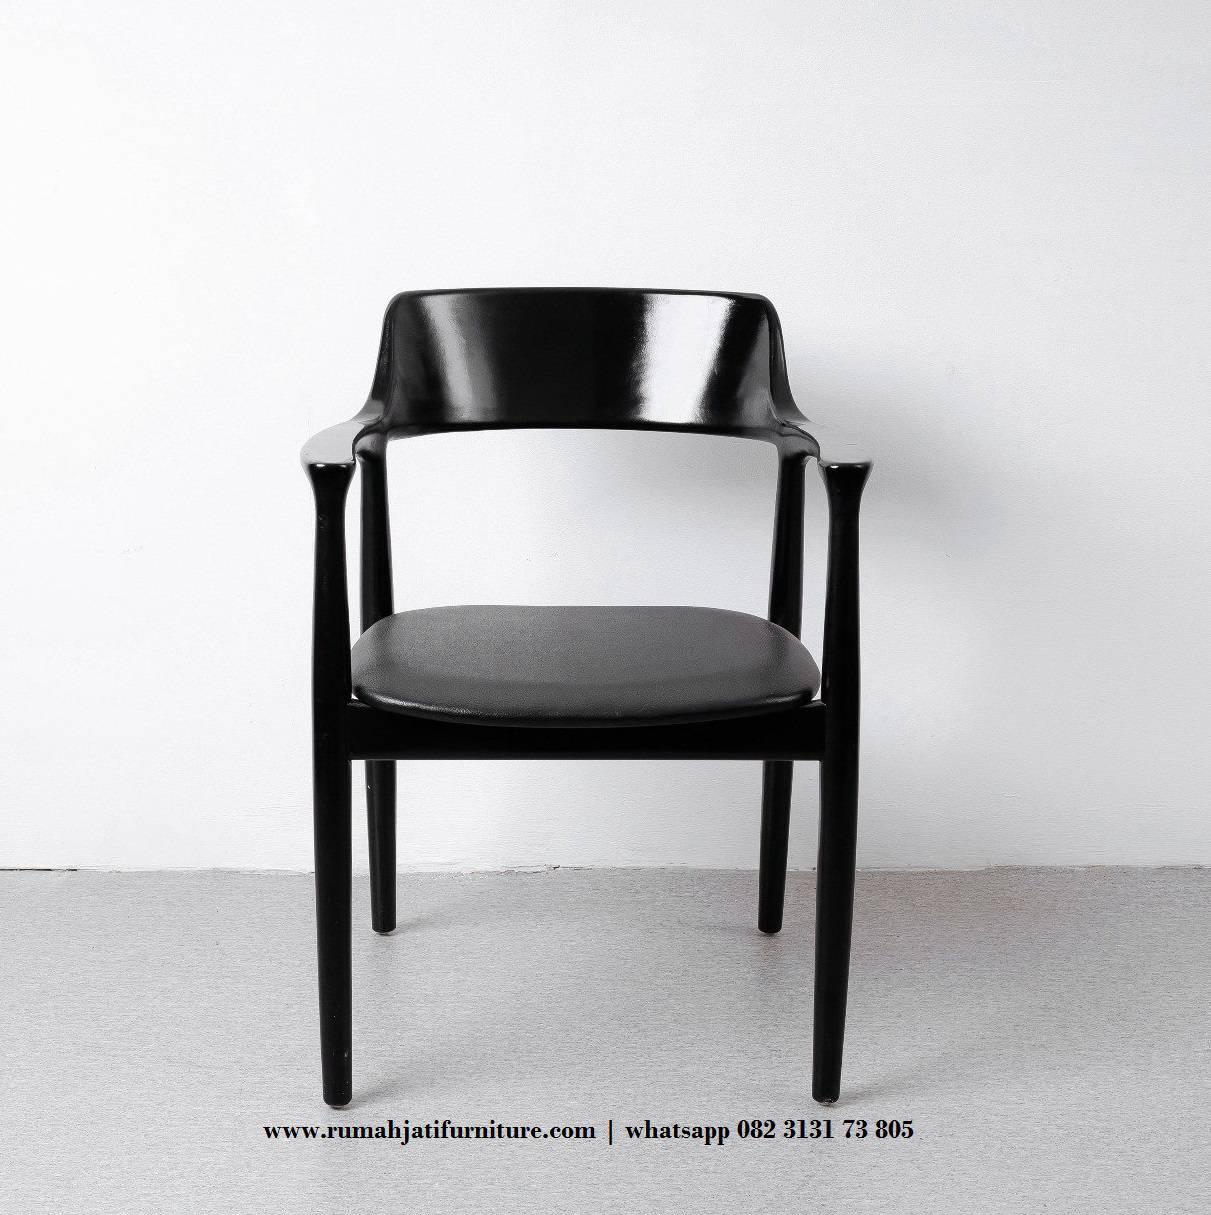 Gambar Kursi Makan Cafe Ala Jepang Kayu Jati Hitam | Rumah Jati Furniture